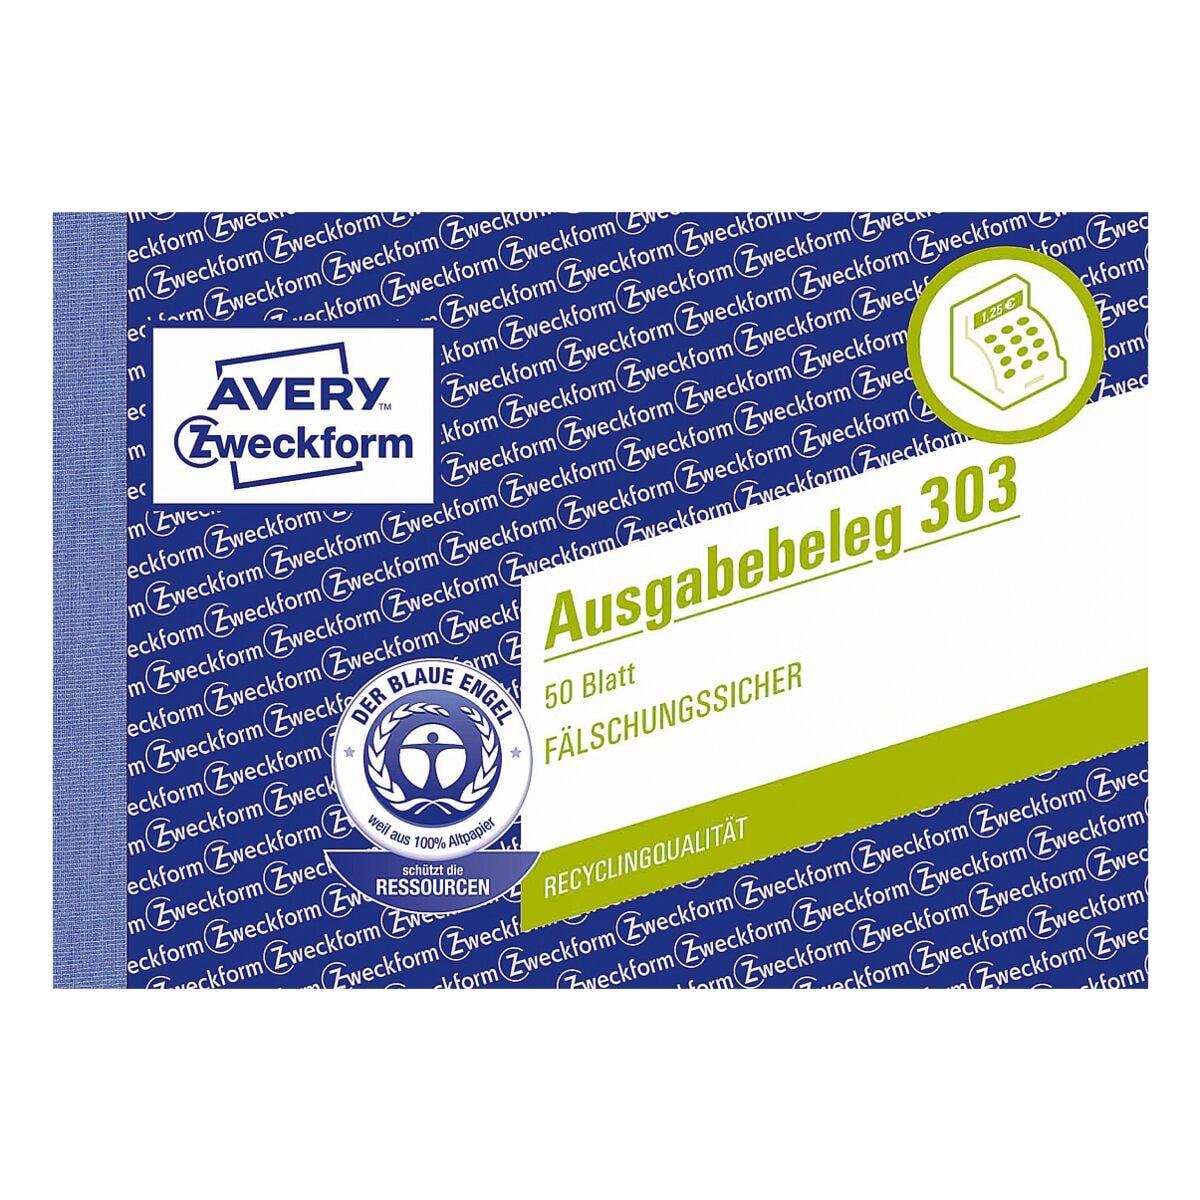 Avery Zweckform Formularbuch »Ausgabebeleg mit Dokumentendruck«